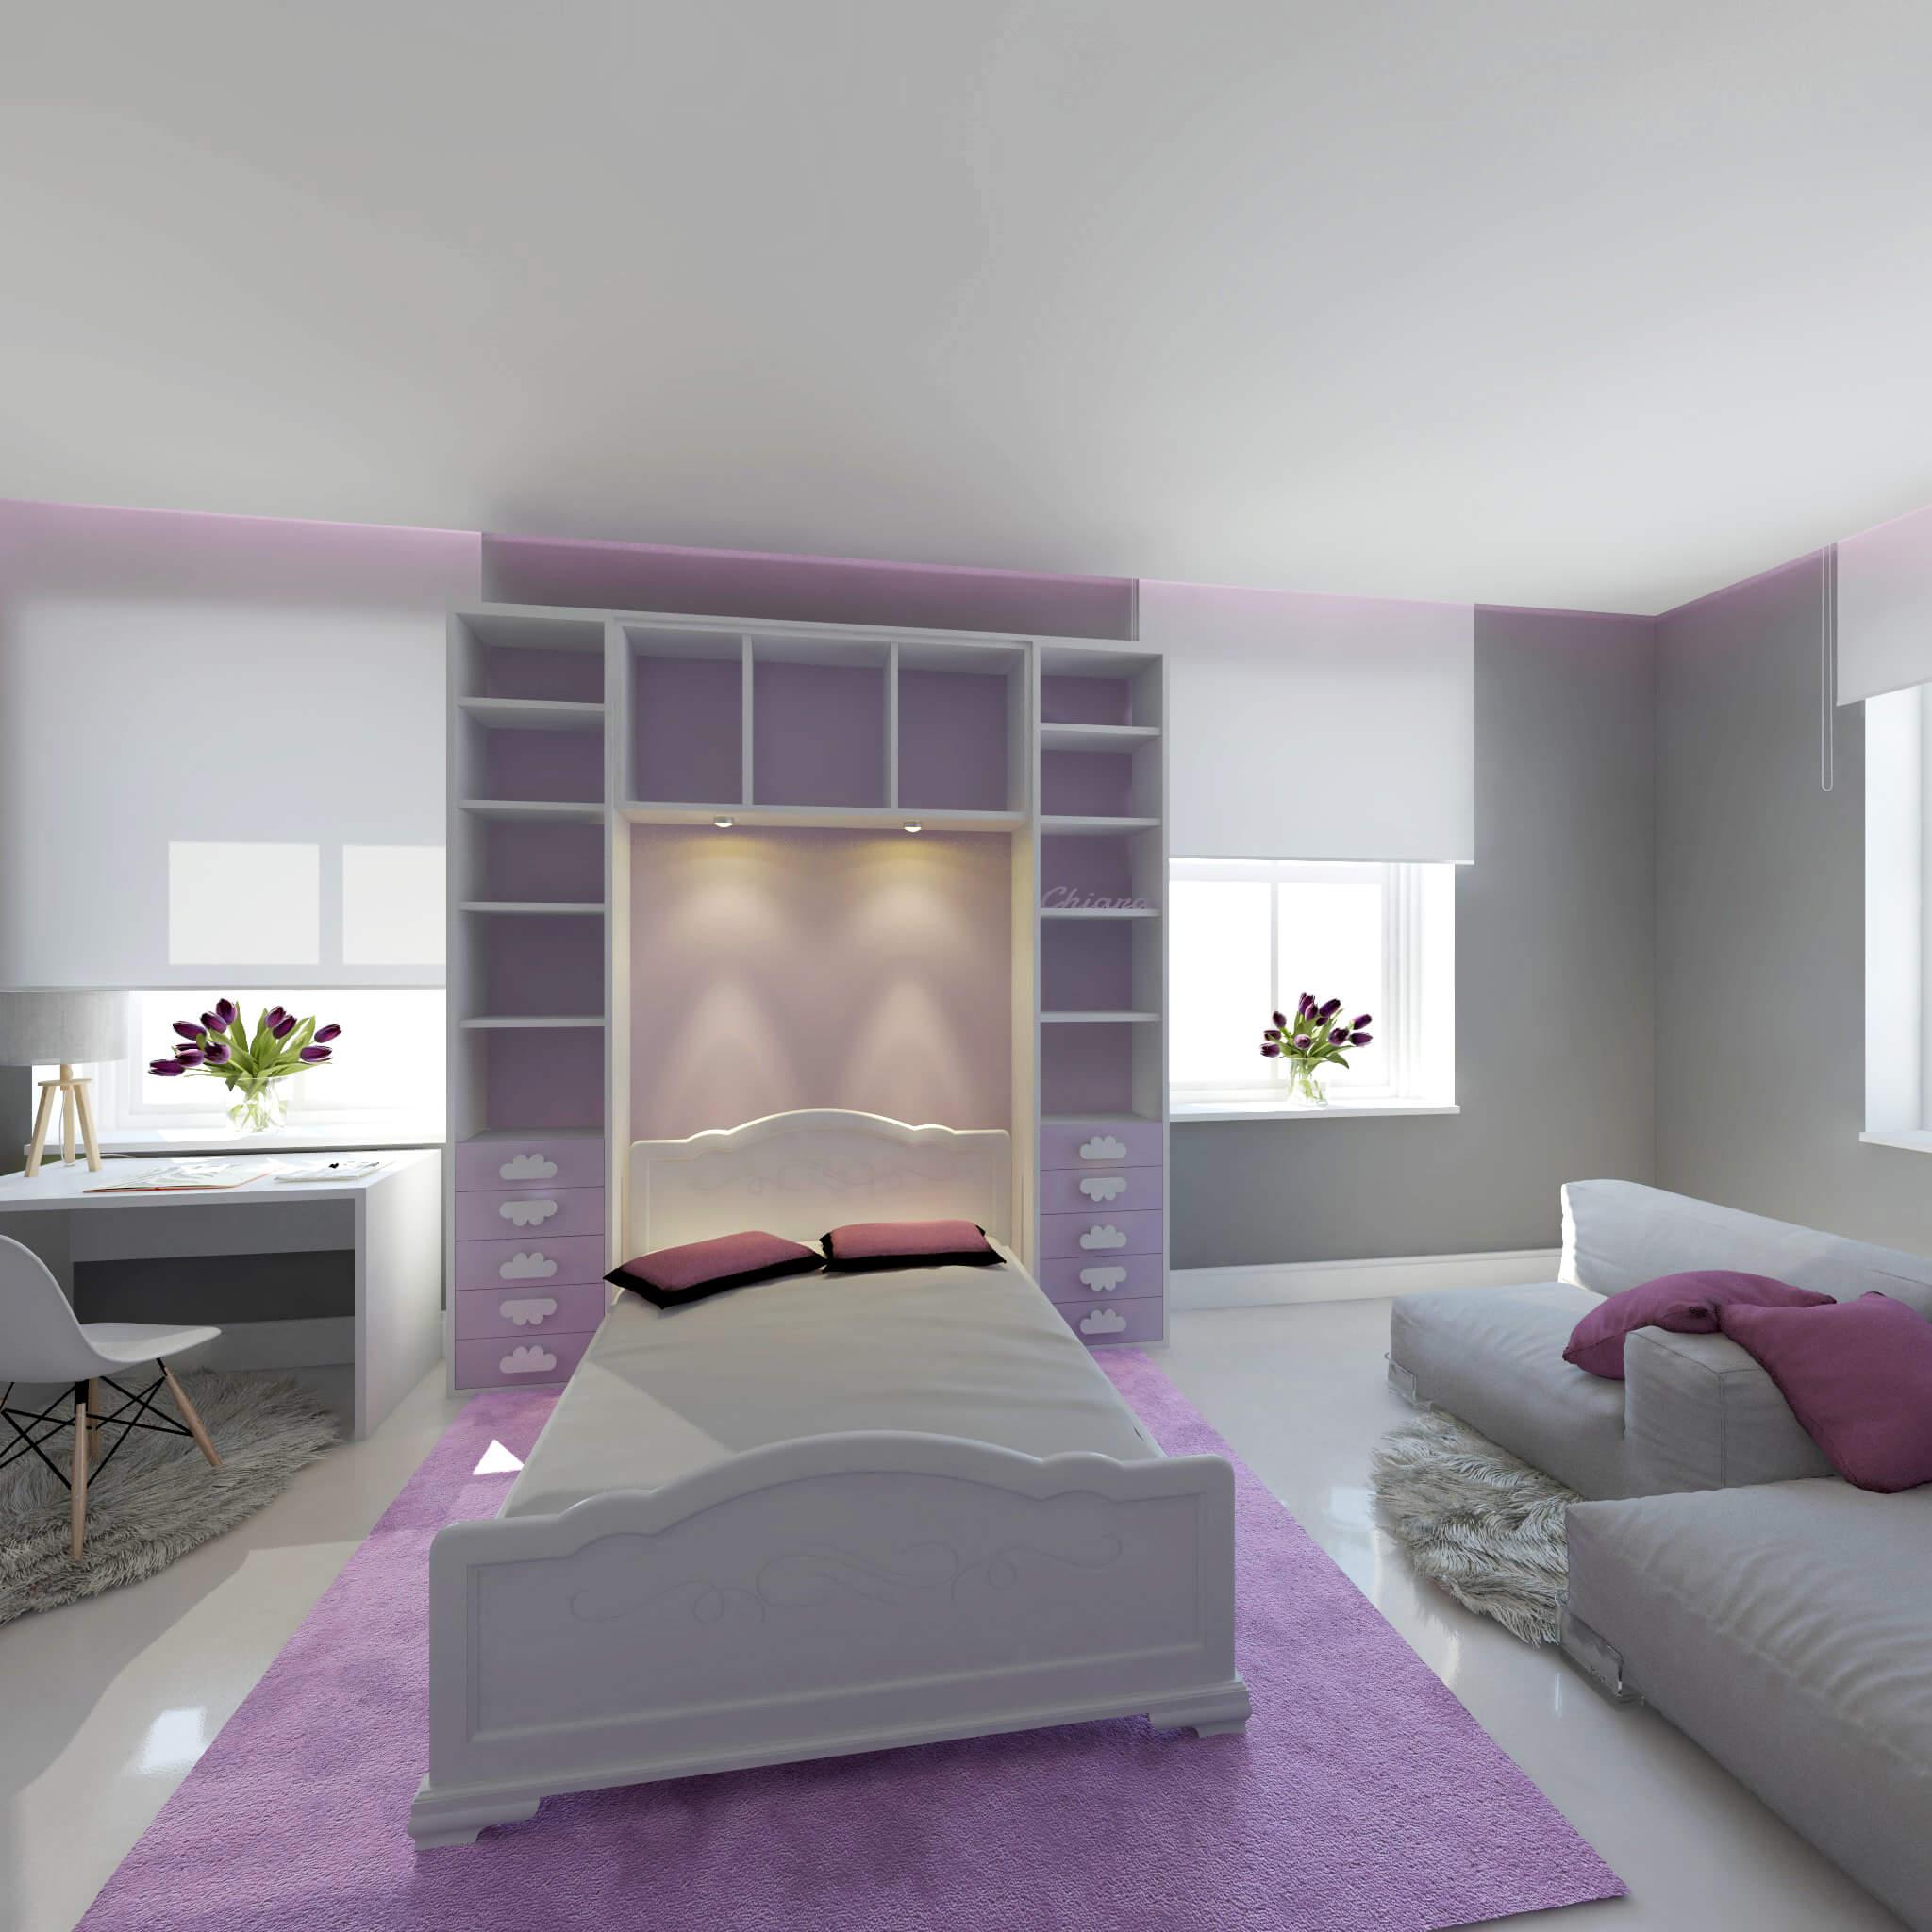 Jugendzimmer Design by Torsten Müller aus Bad Honnef nähe Köln Bonn Verkauf Beratung Planung Interior Designer 3D Lifestyle- (13)